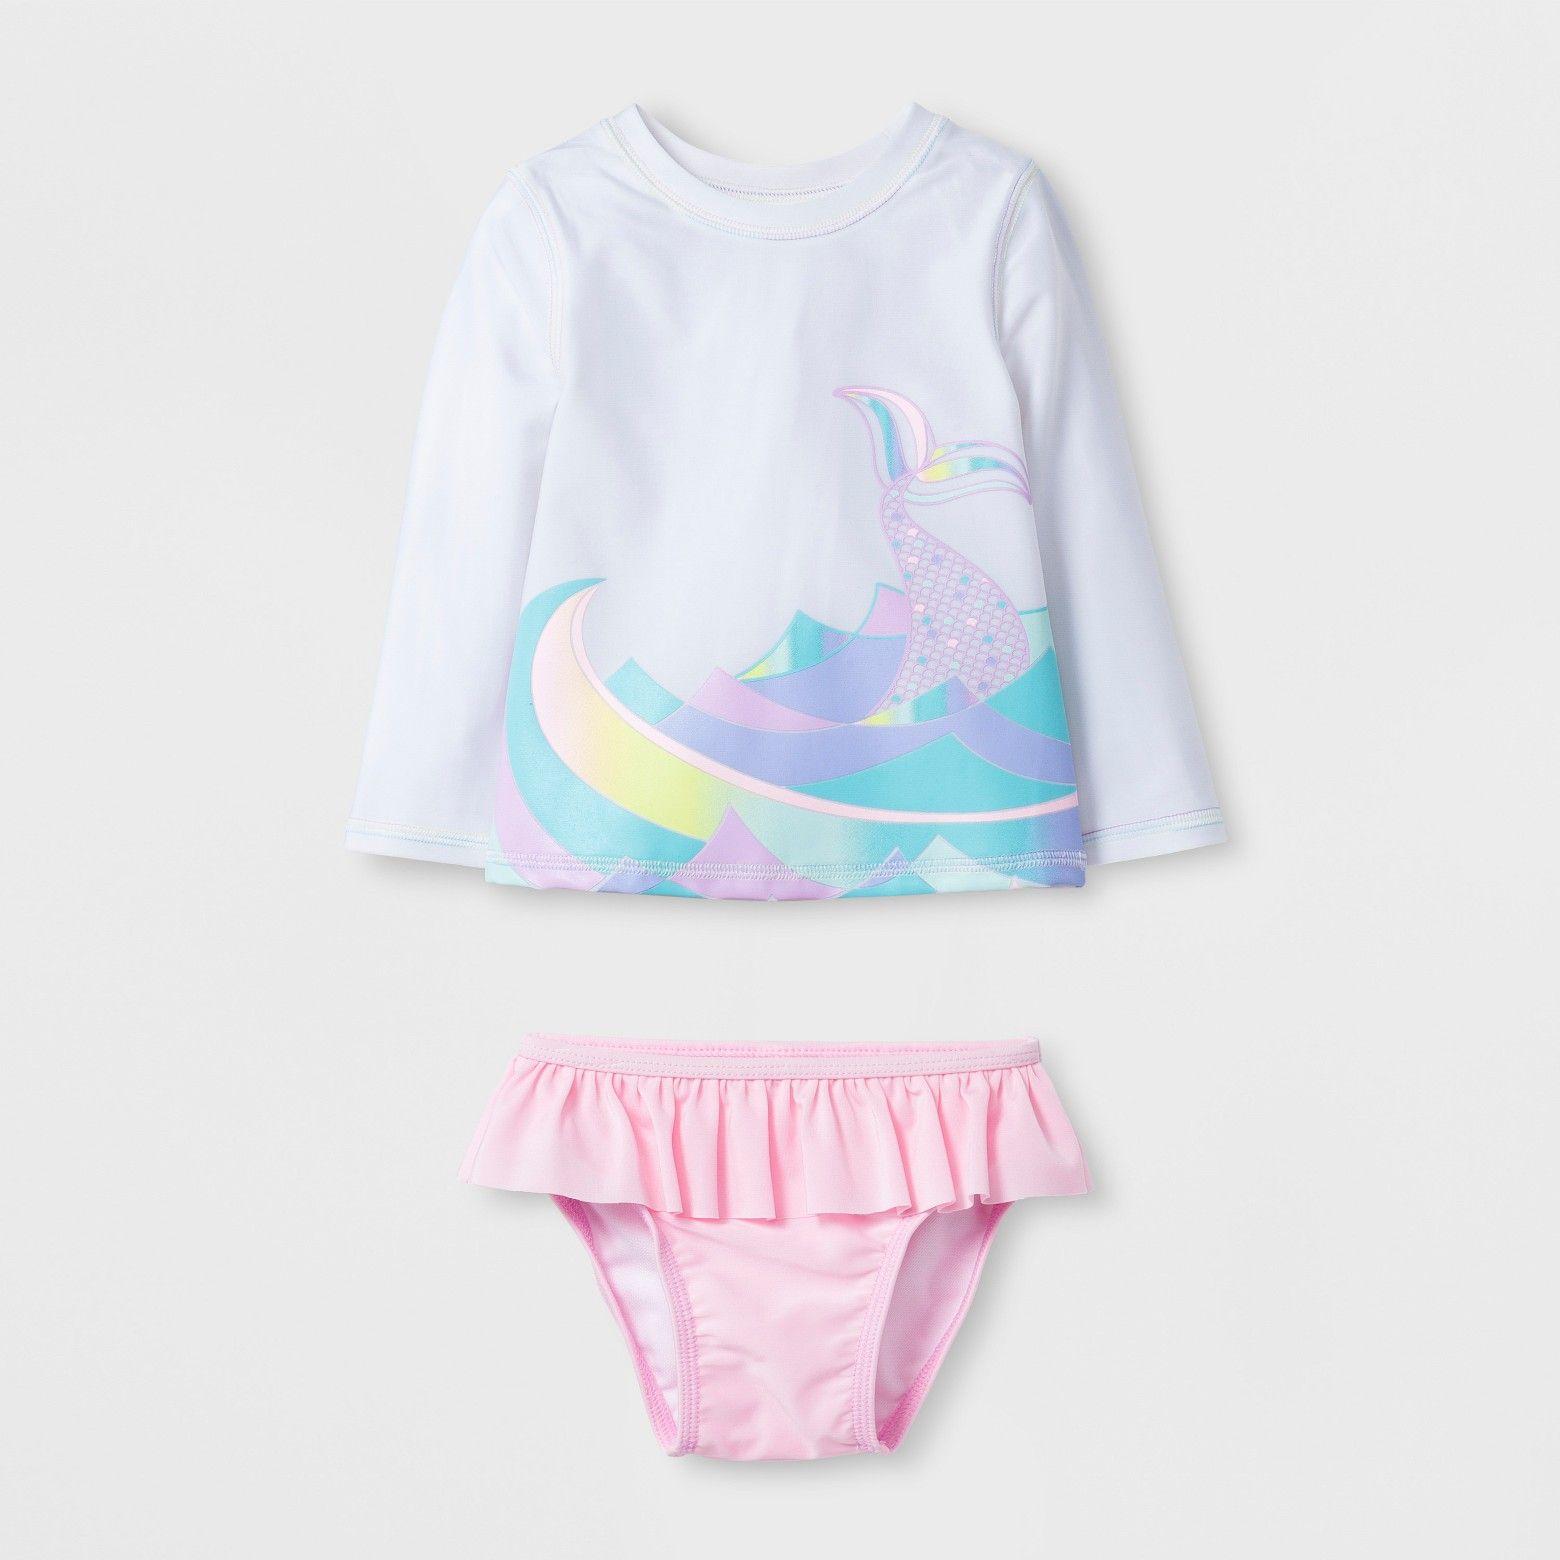 Target Baby Girl Clothes Baby Girls' Waves Rash Guard Set  Cat & Jack™ White  Target  Baby